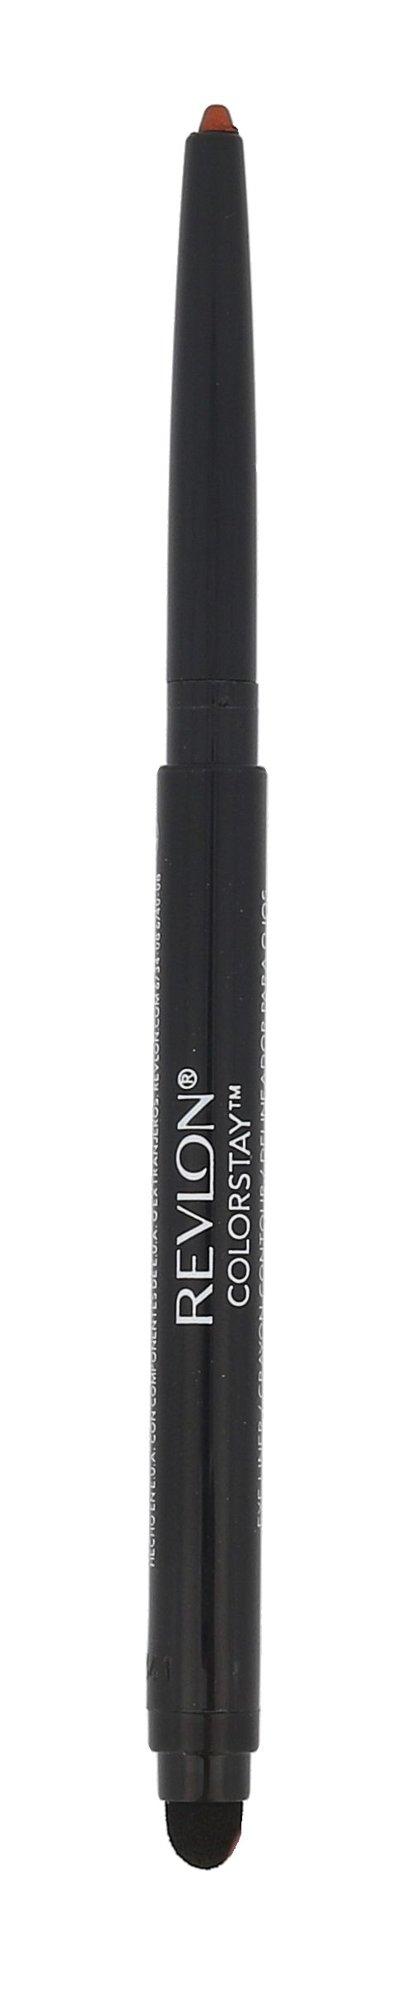 Revlon Colorstay Cosmetic 0,28ml Topaz